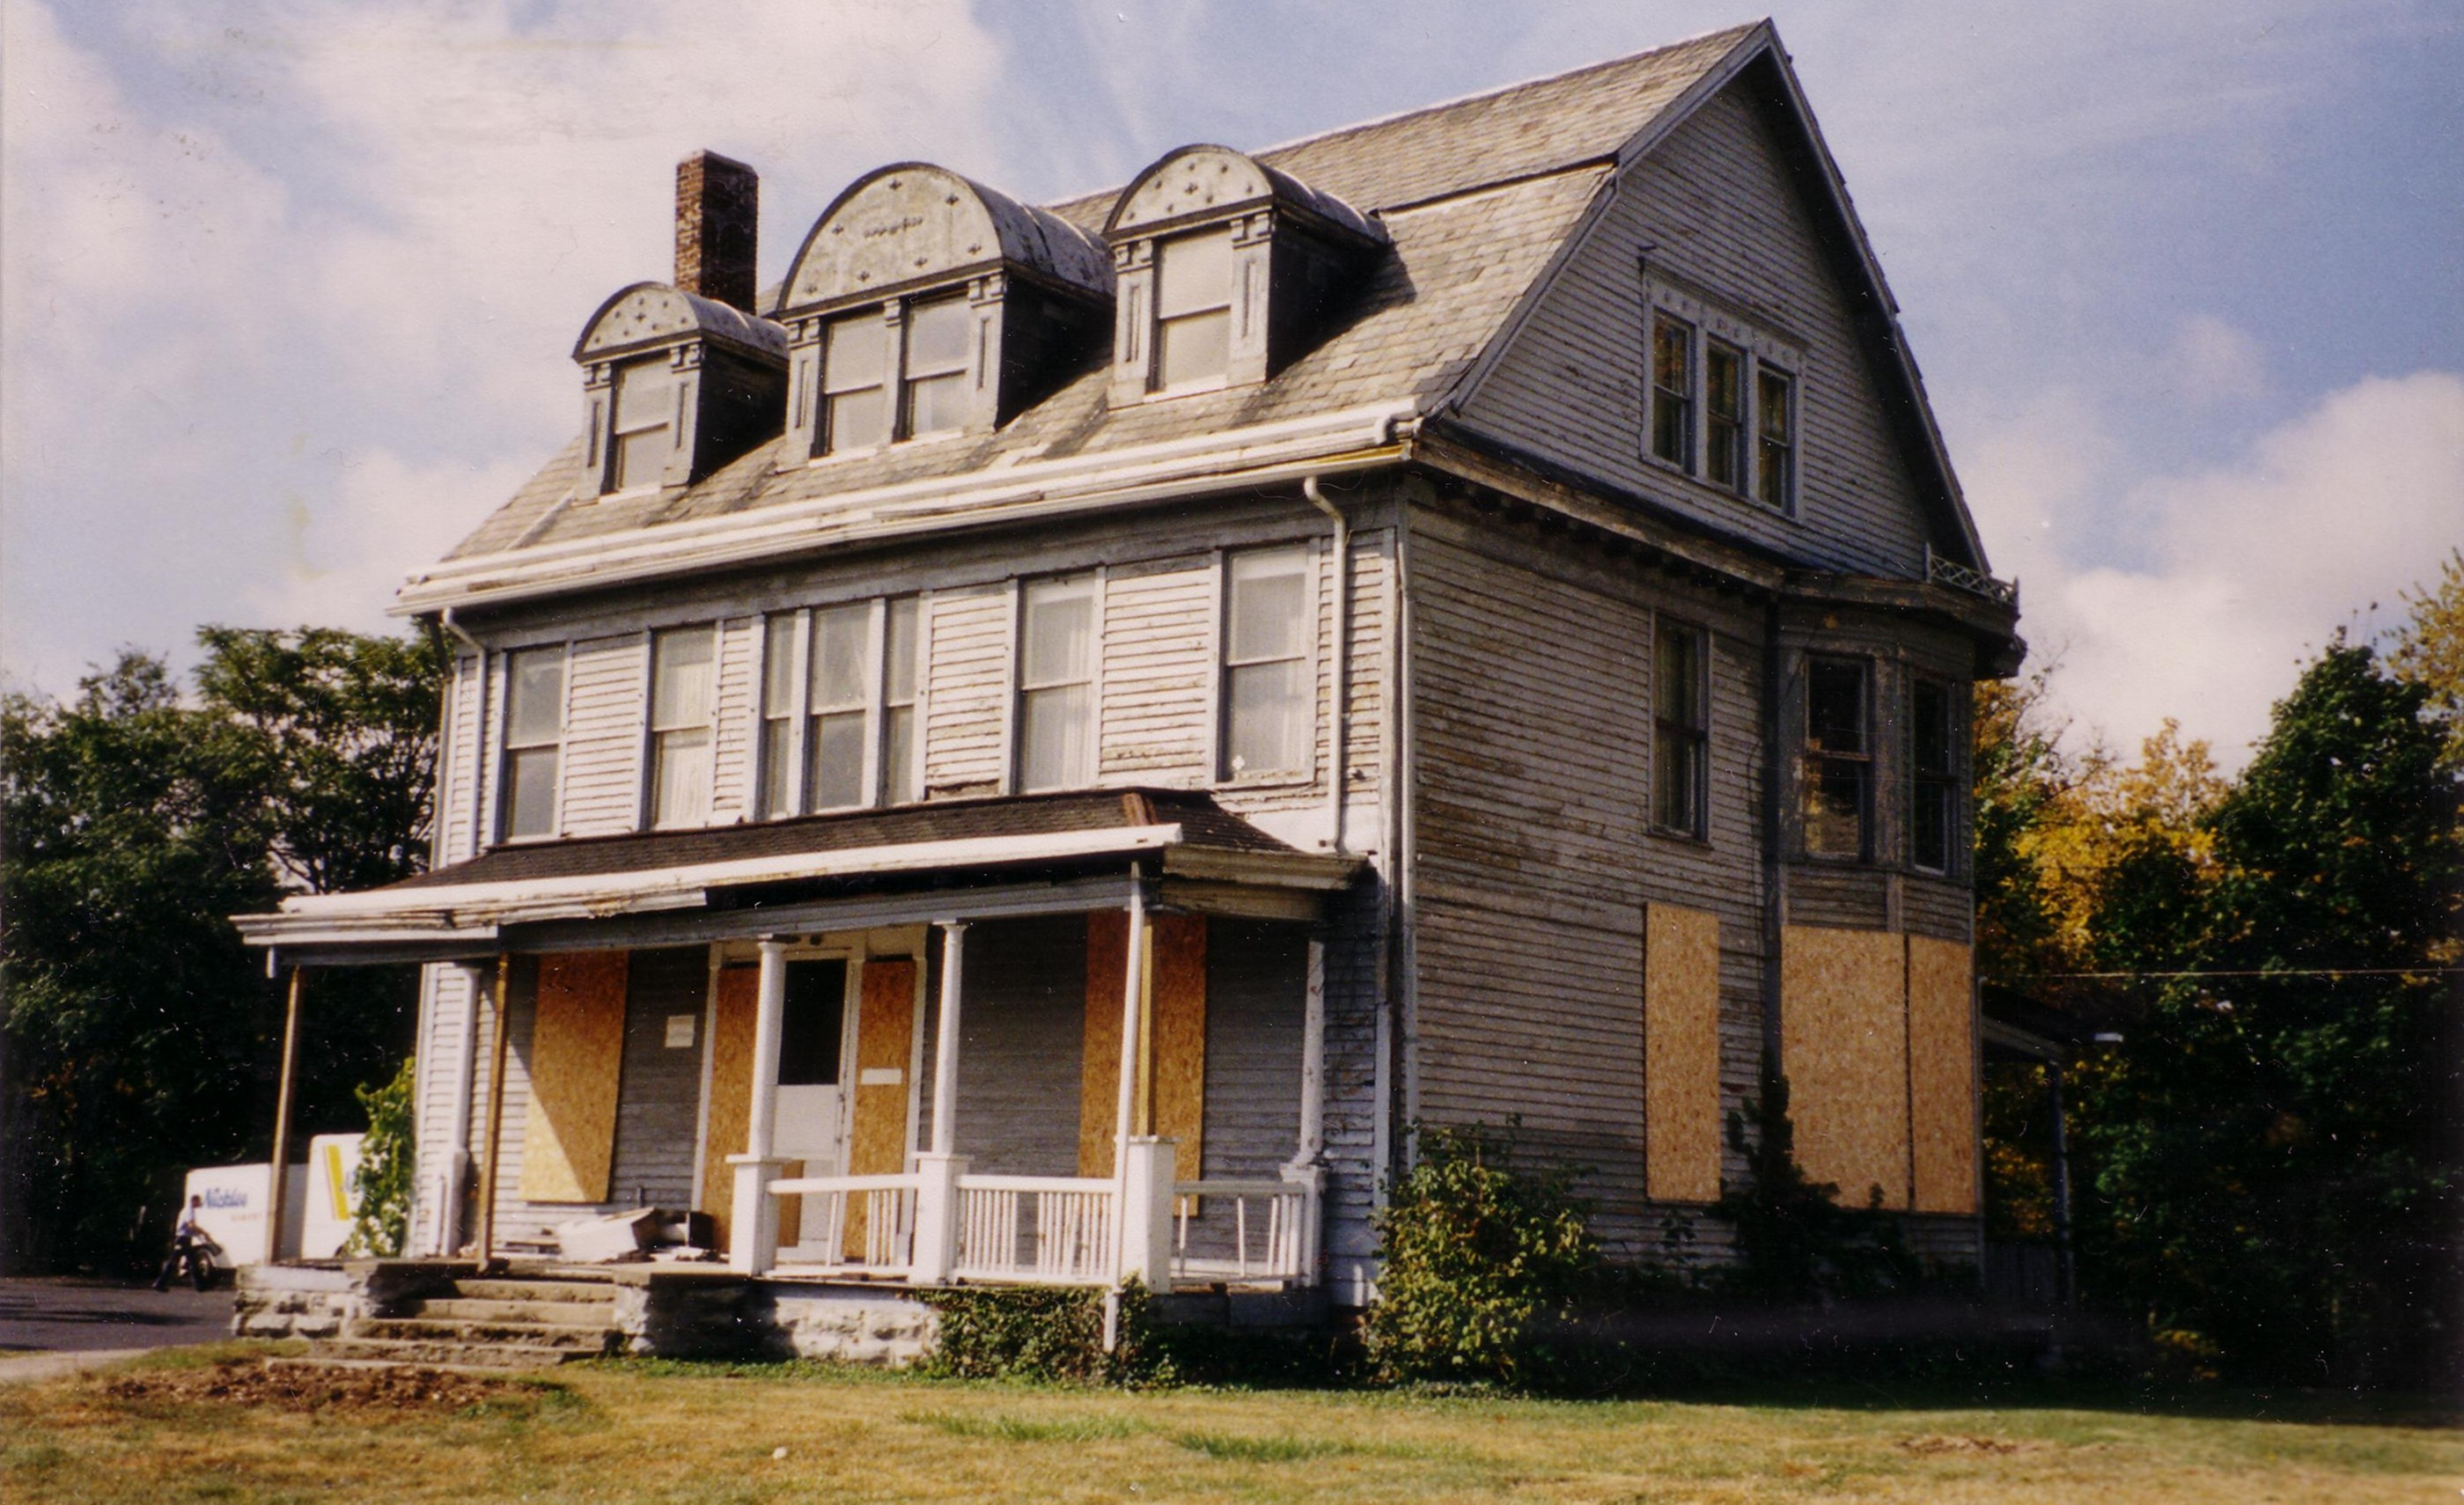 House 1991